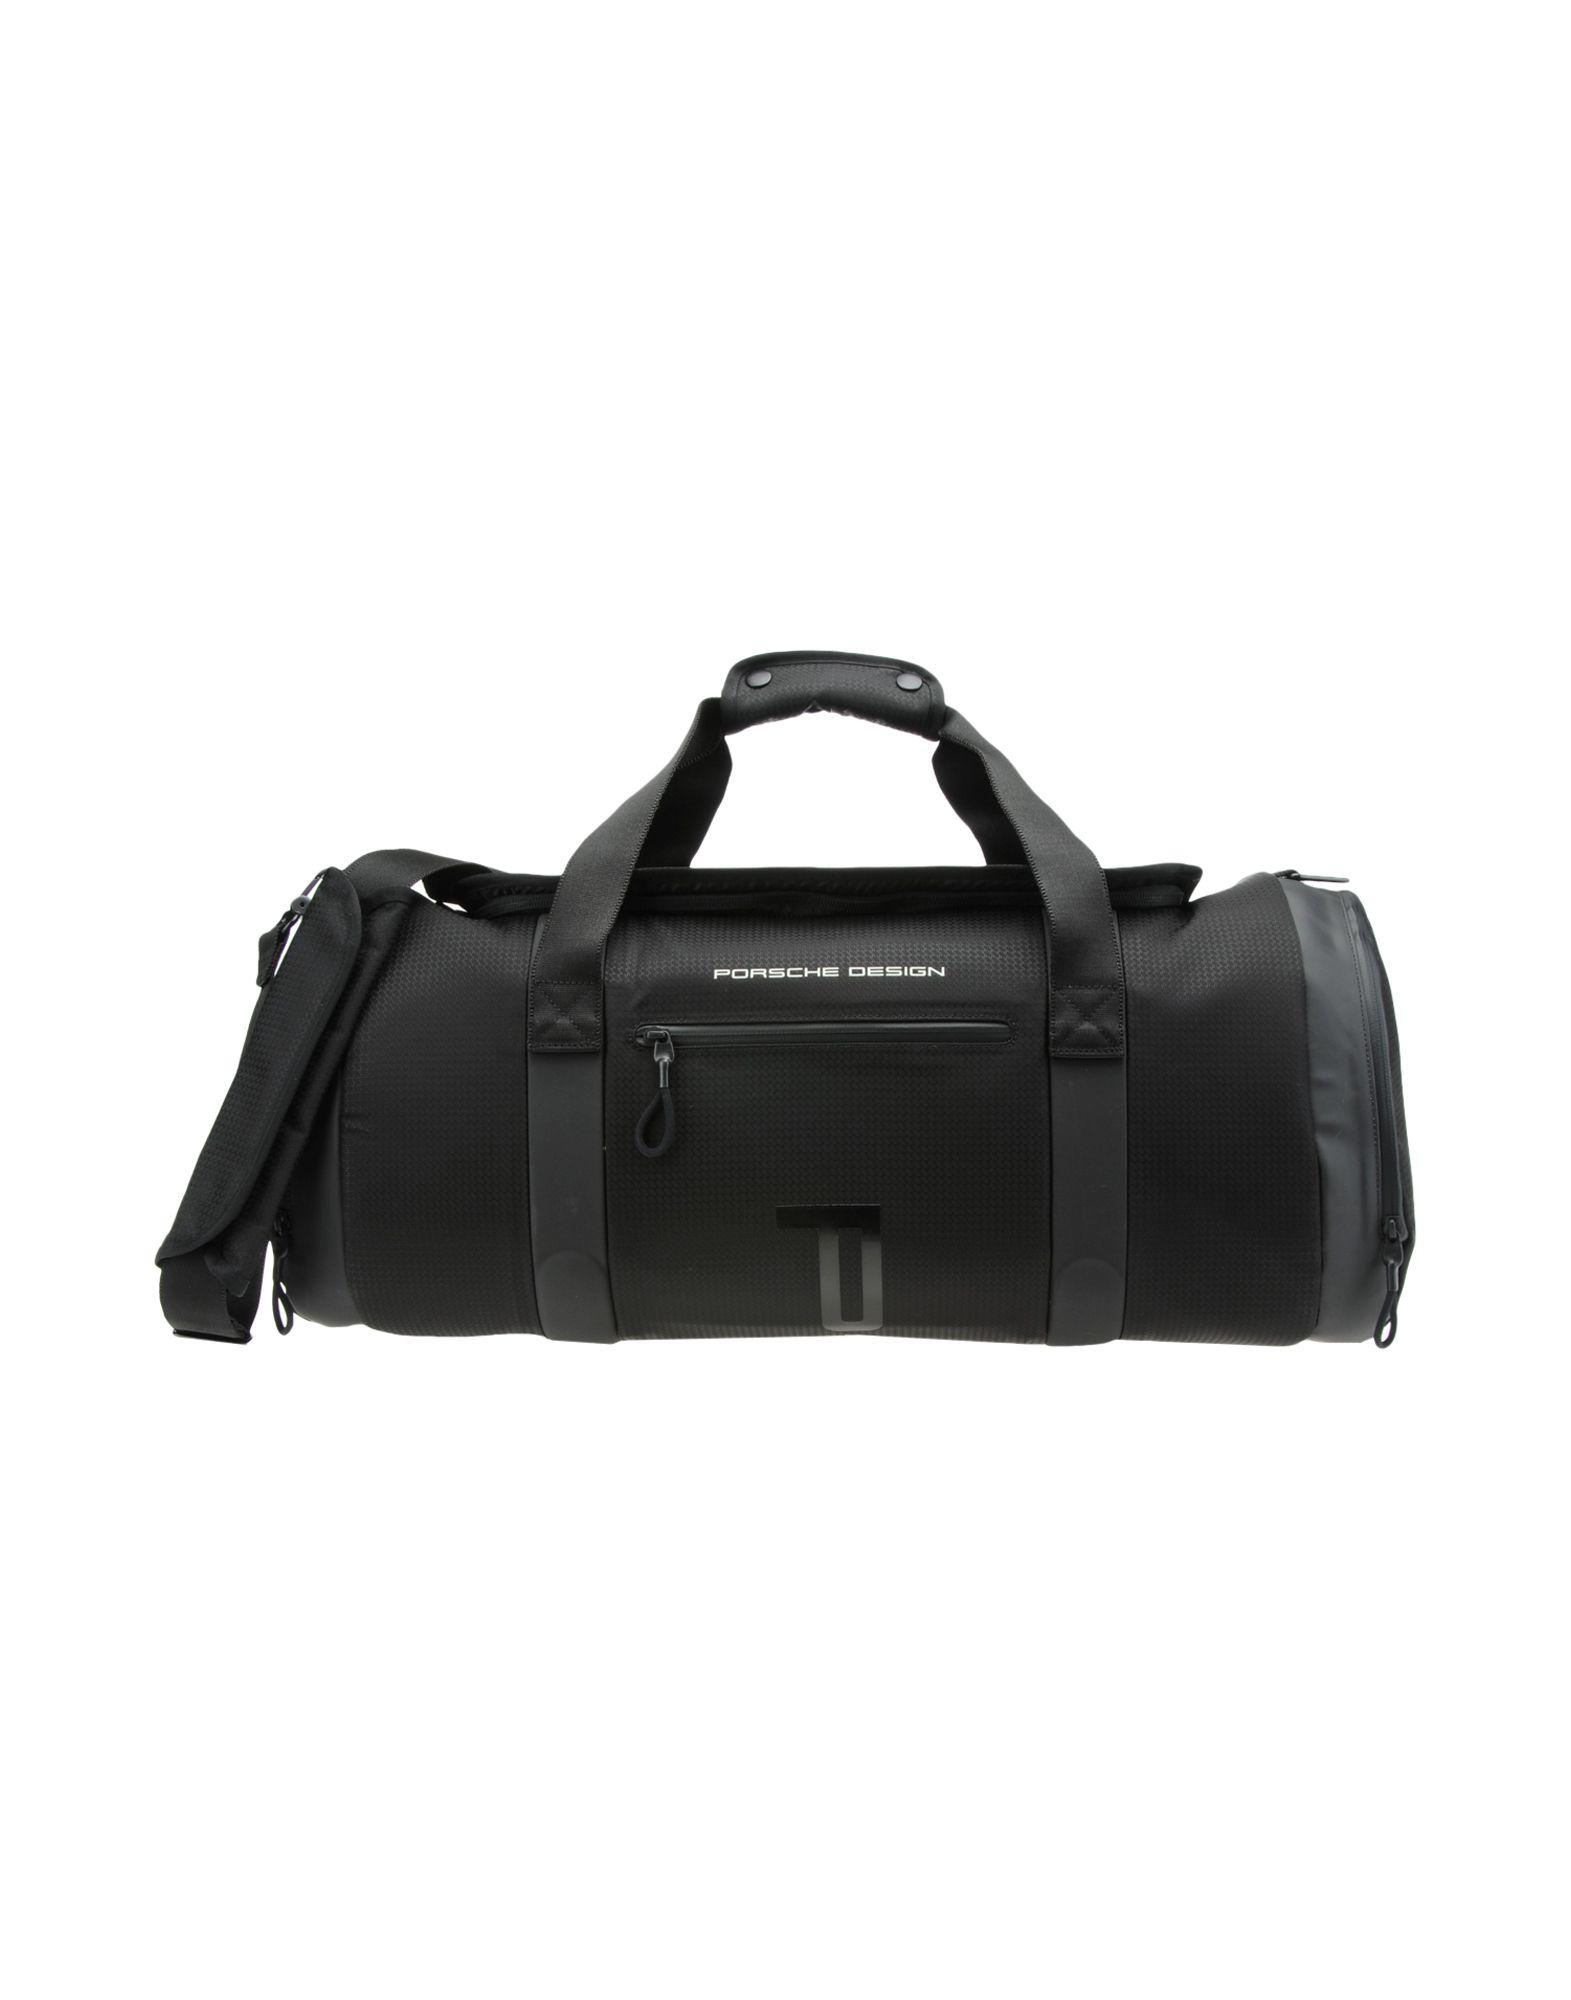 Lyst - Porsche Design Top-Handle Duffle Bag in Black for Men 7079a27de929e